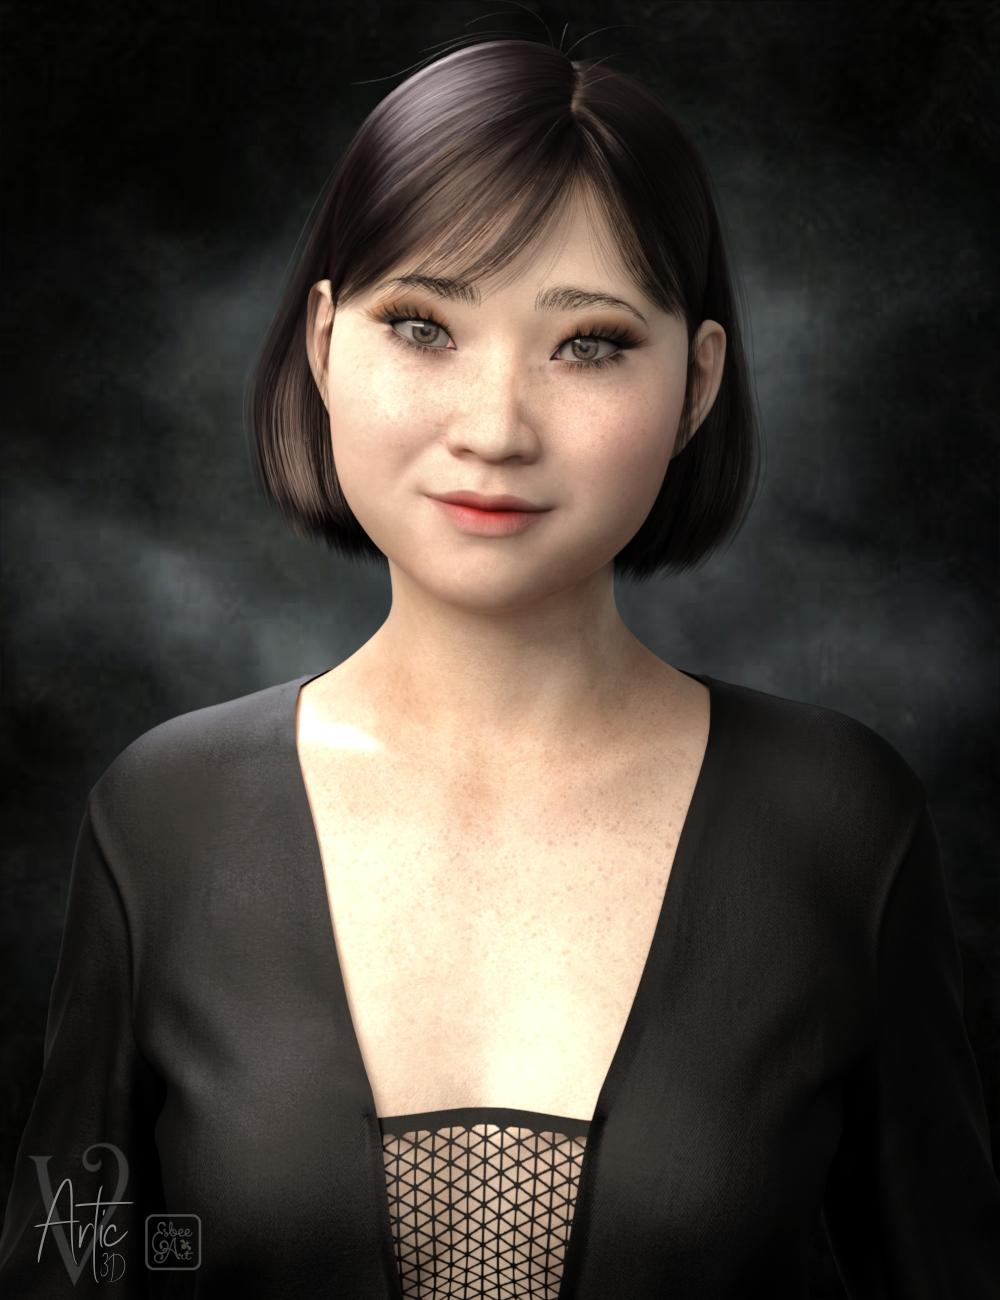 Nozomi Portrait_sbauser-b6264f3d